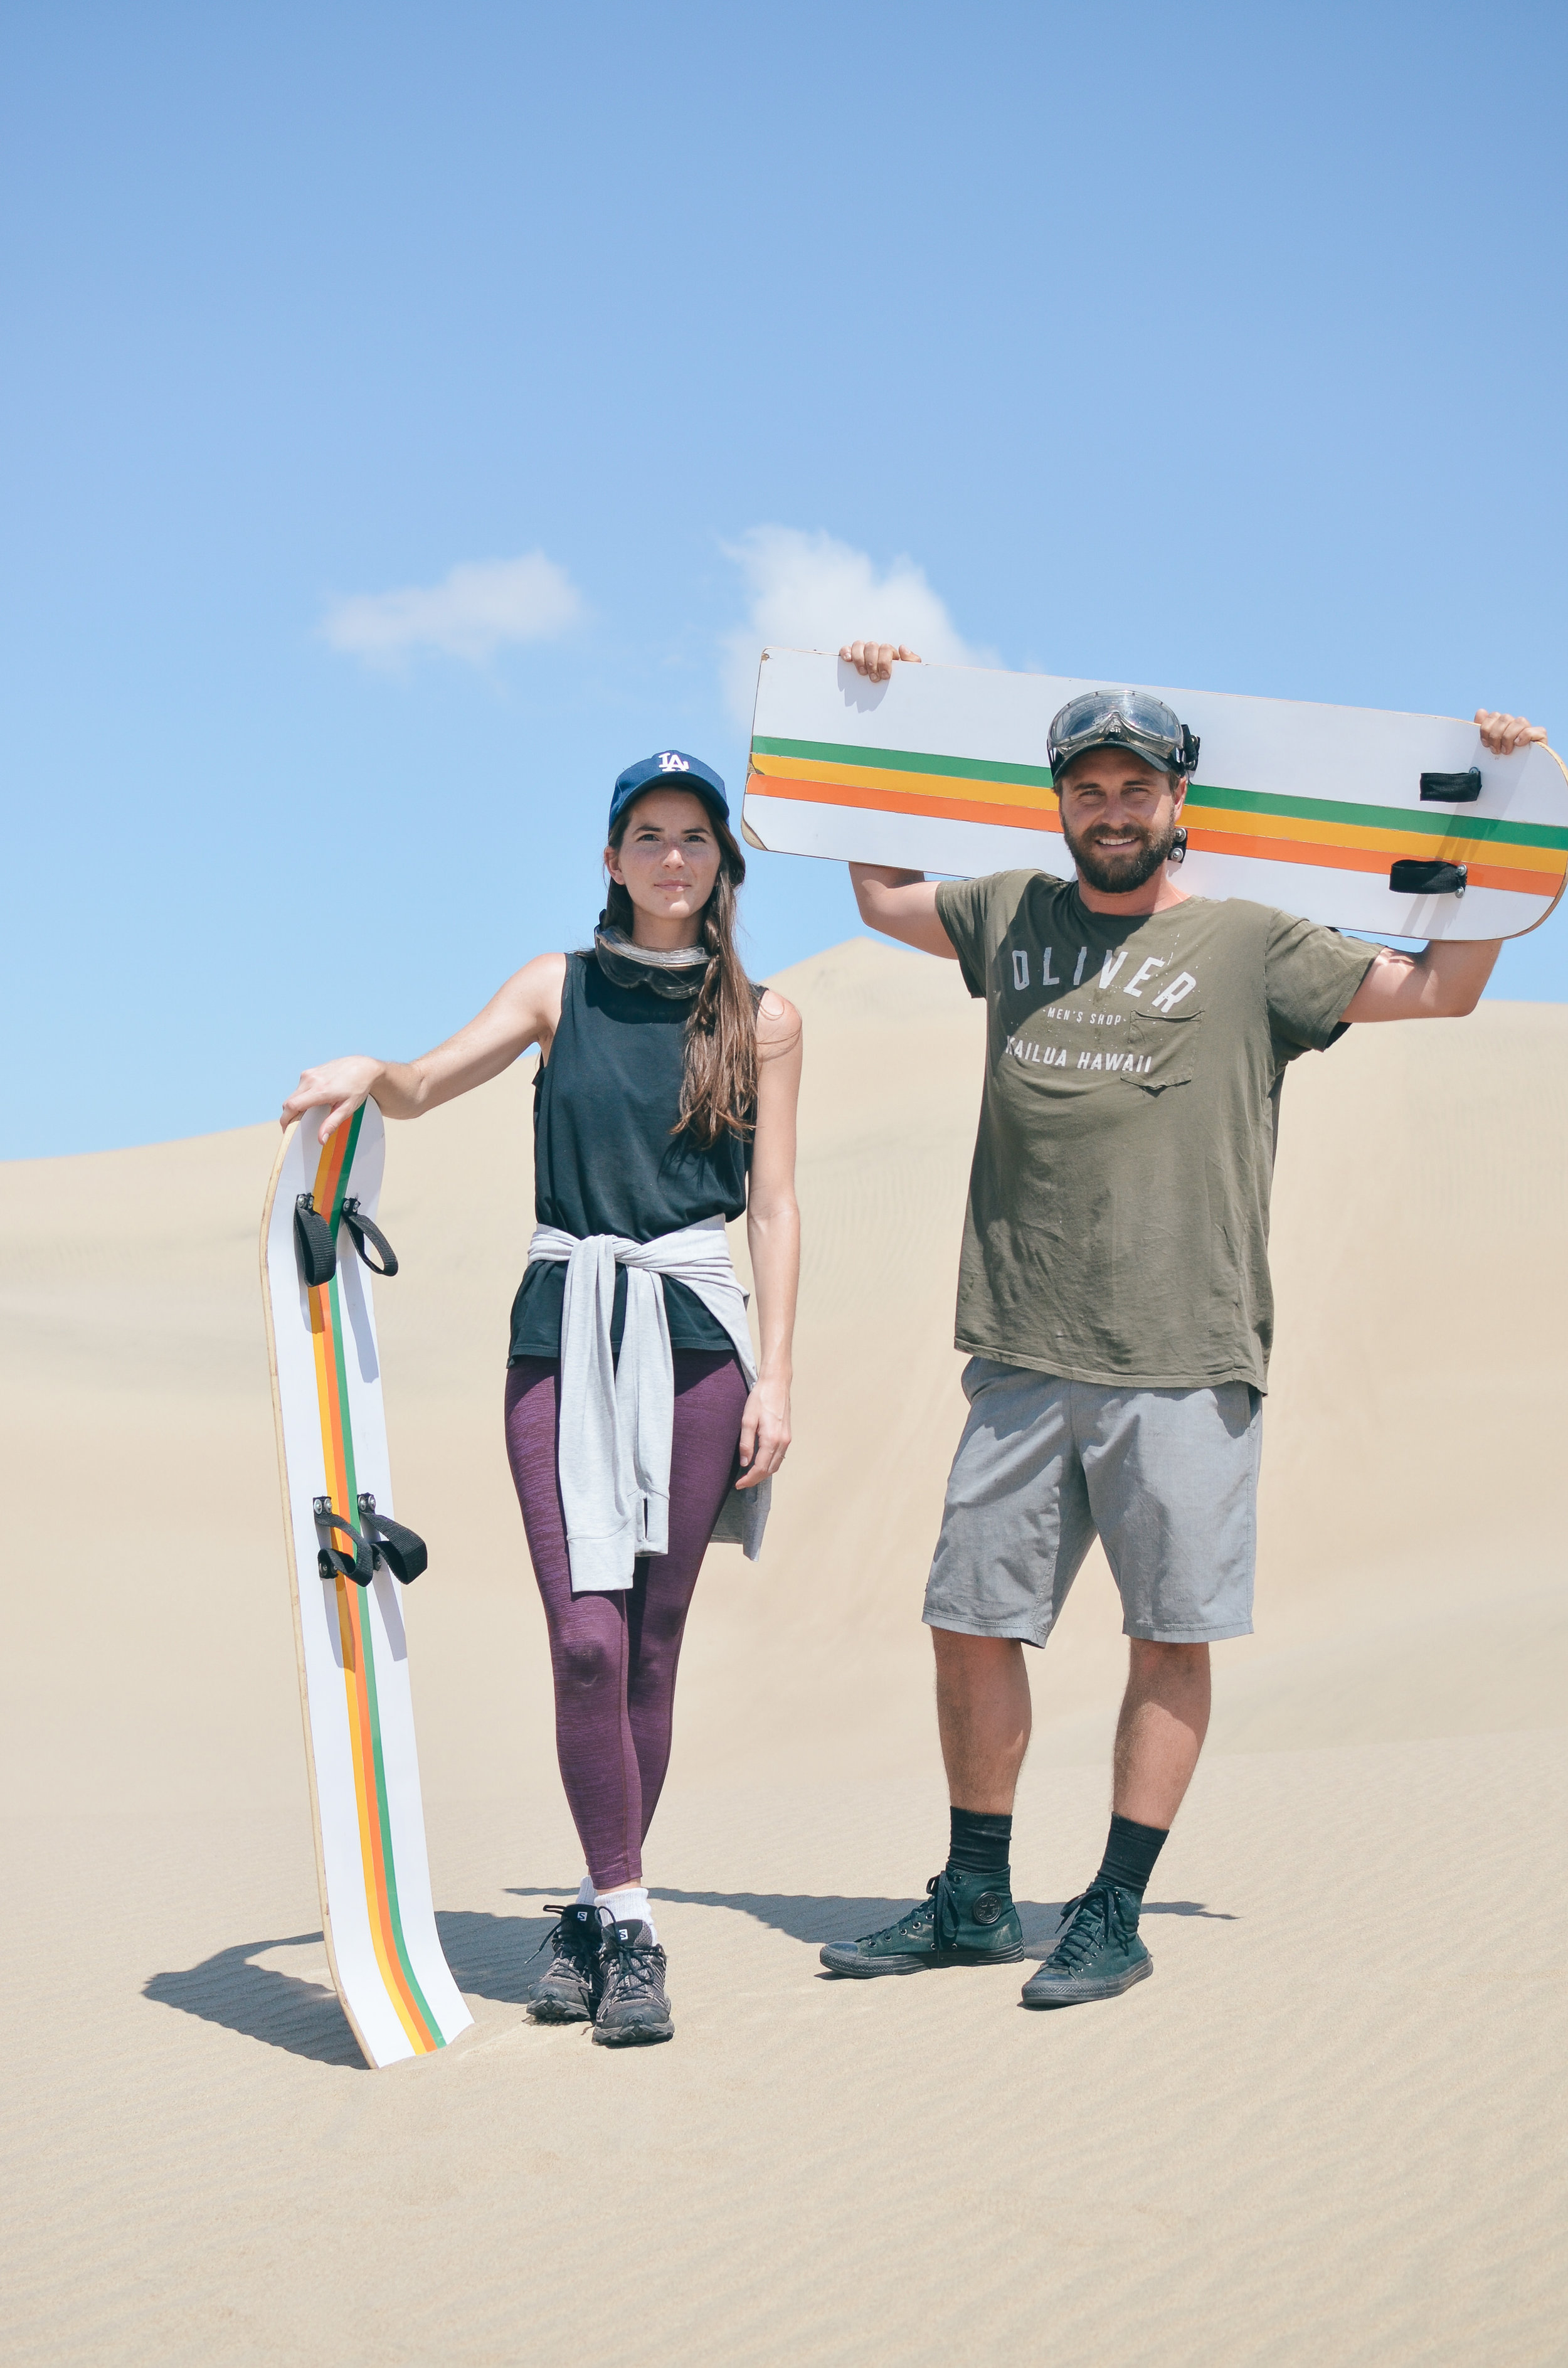 huacachina+sand+boarding+peru+travel+guide+life+on+pine+blog +exchange_DSC_1833.jpg